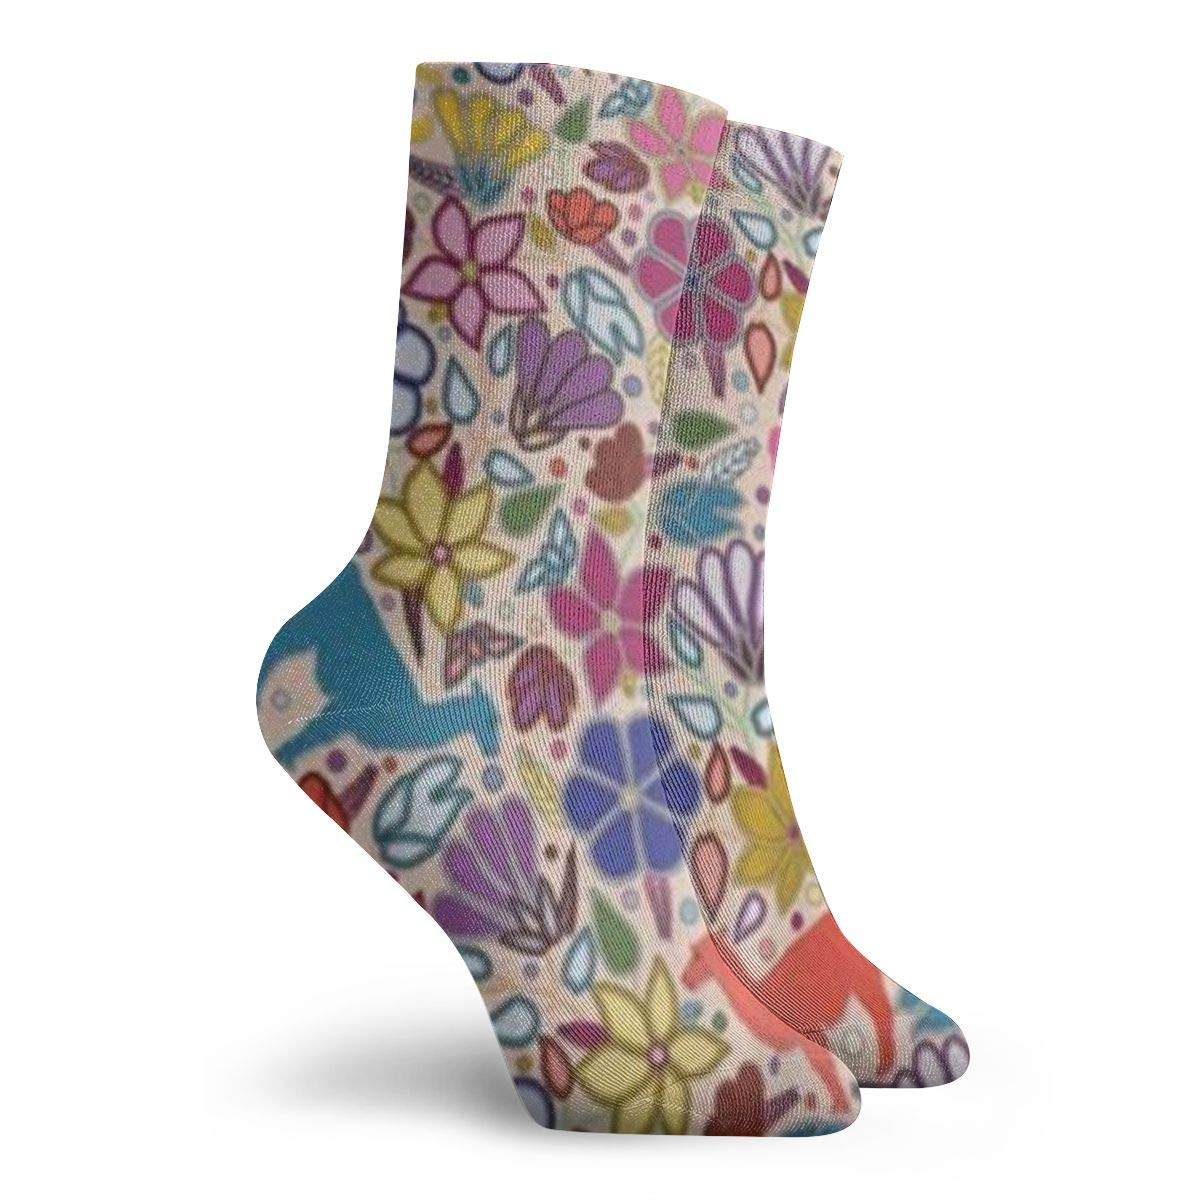 Jokerbilibili Peruvian Llamas Unisex Print Athletic Quarter//Ankle Running Hiking Socks-Weekend Lounge Short Crew Socks